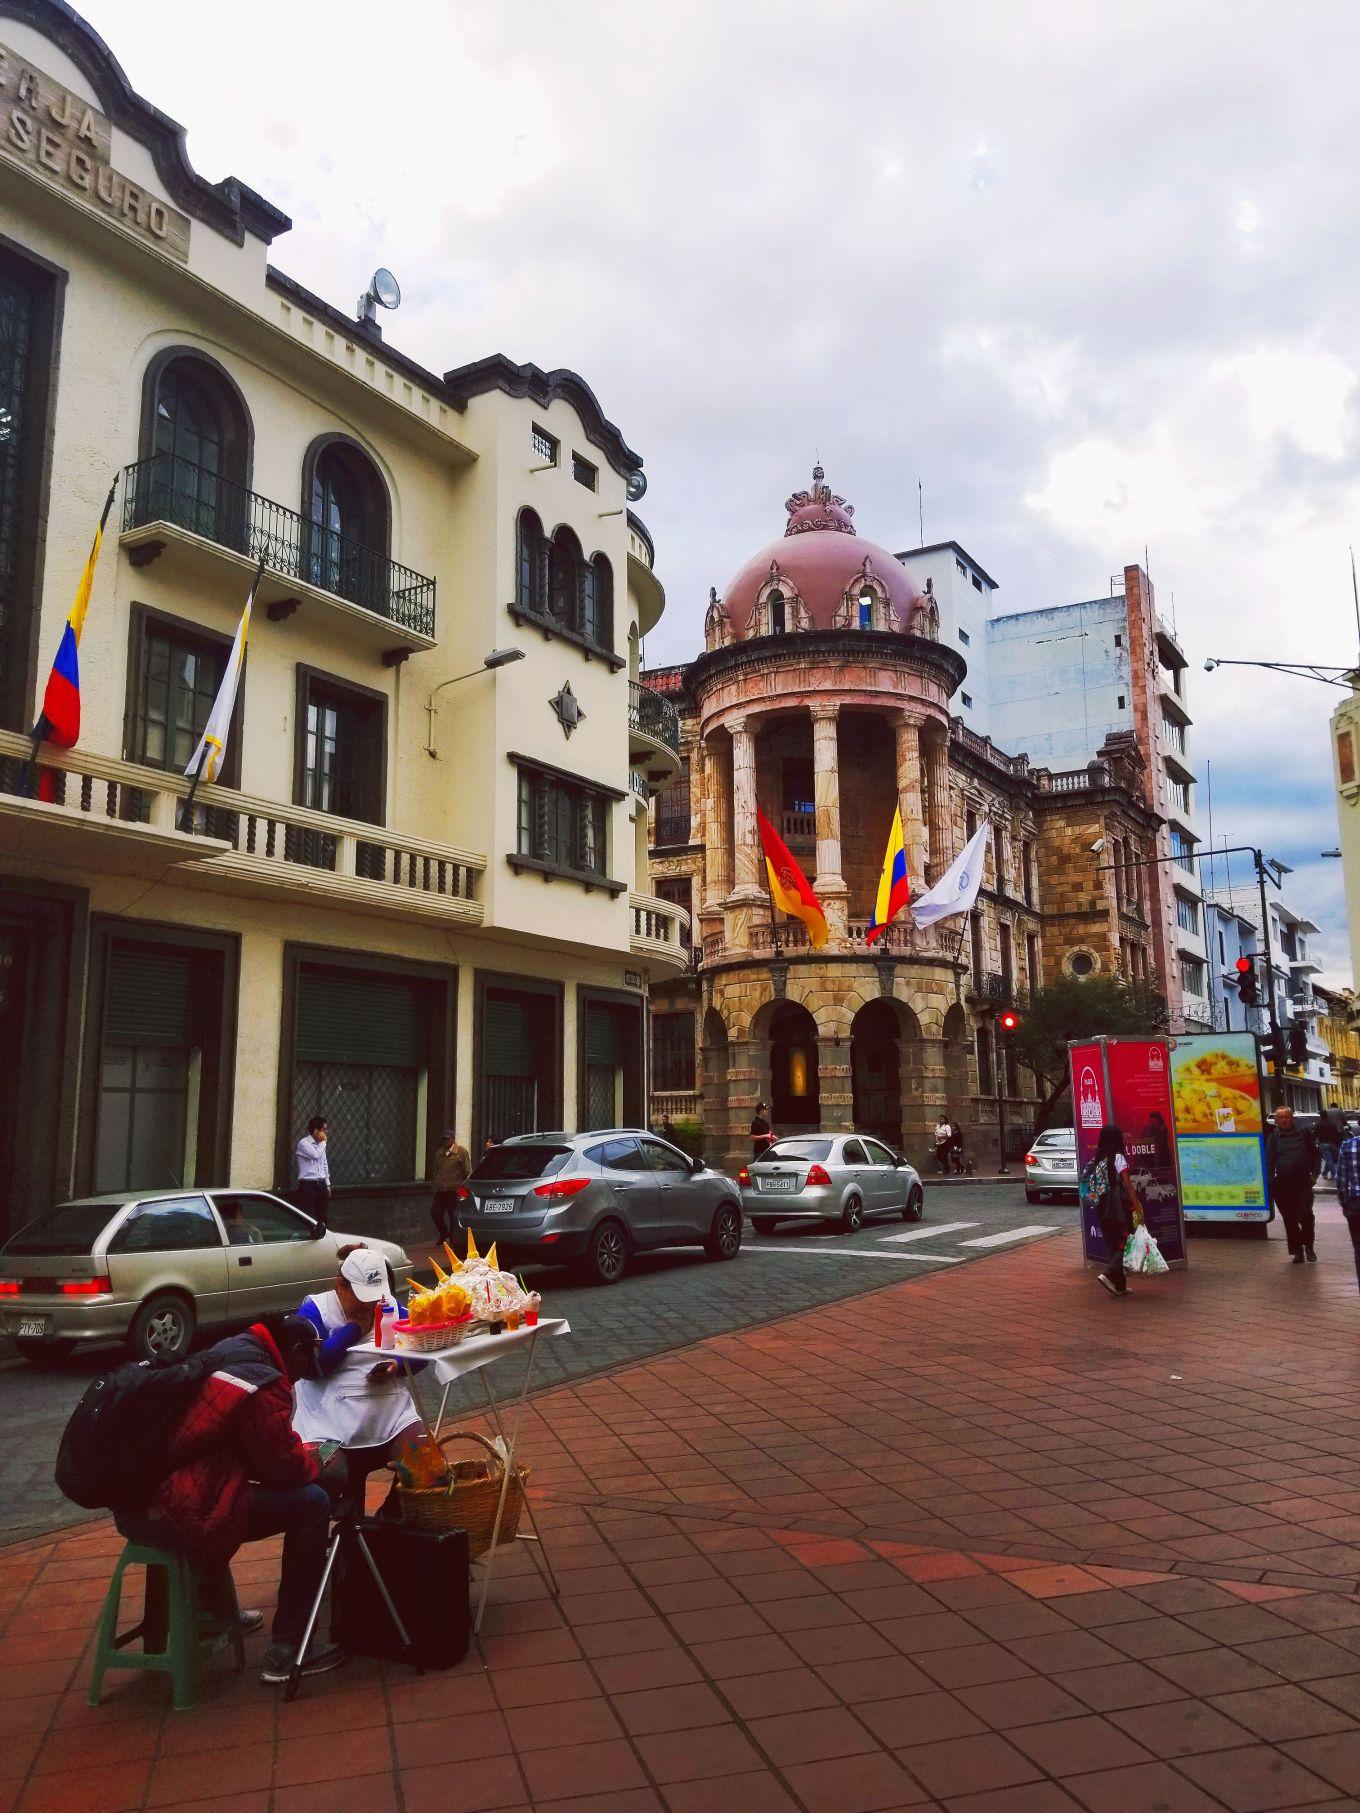 Colonial architecture in the Centro Histórico, Cuenca, Ecuador